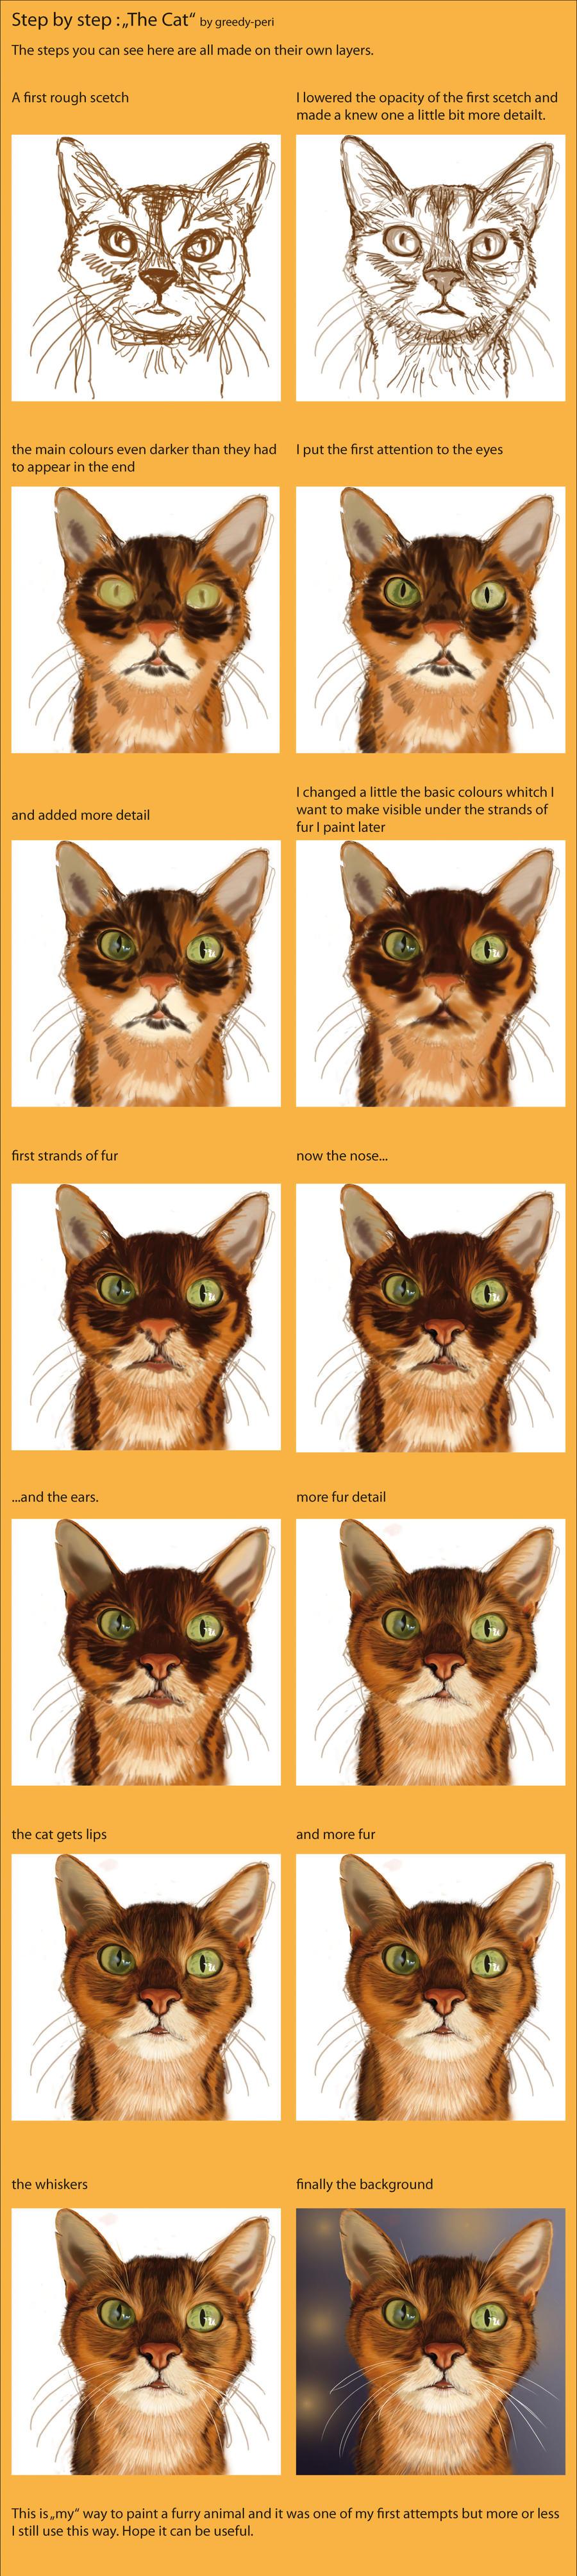 cat- step by step by greedy-peri